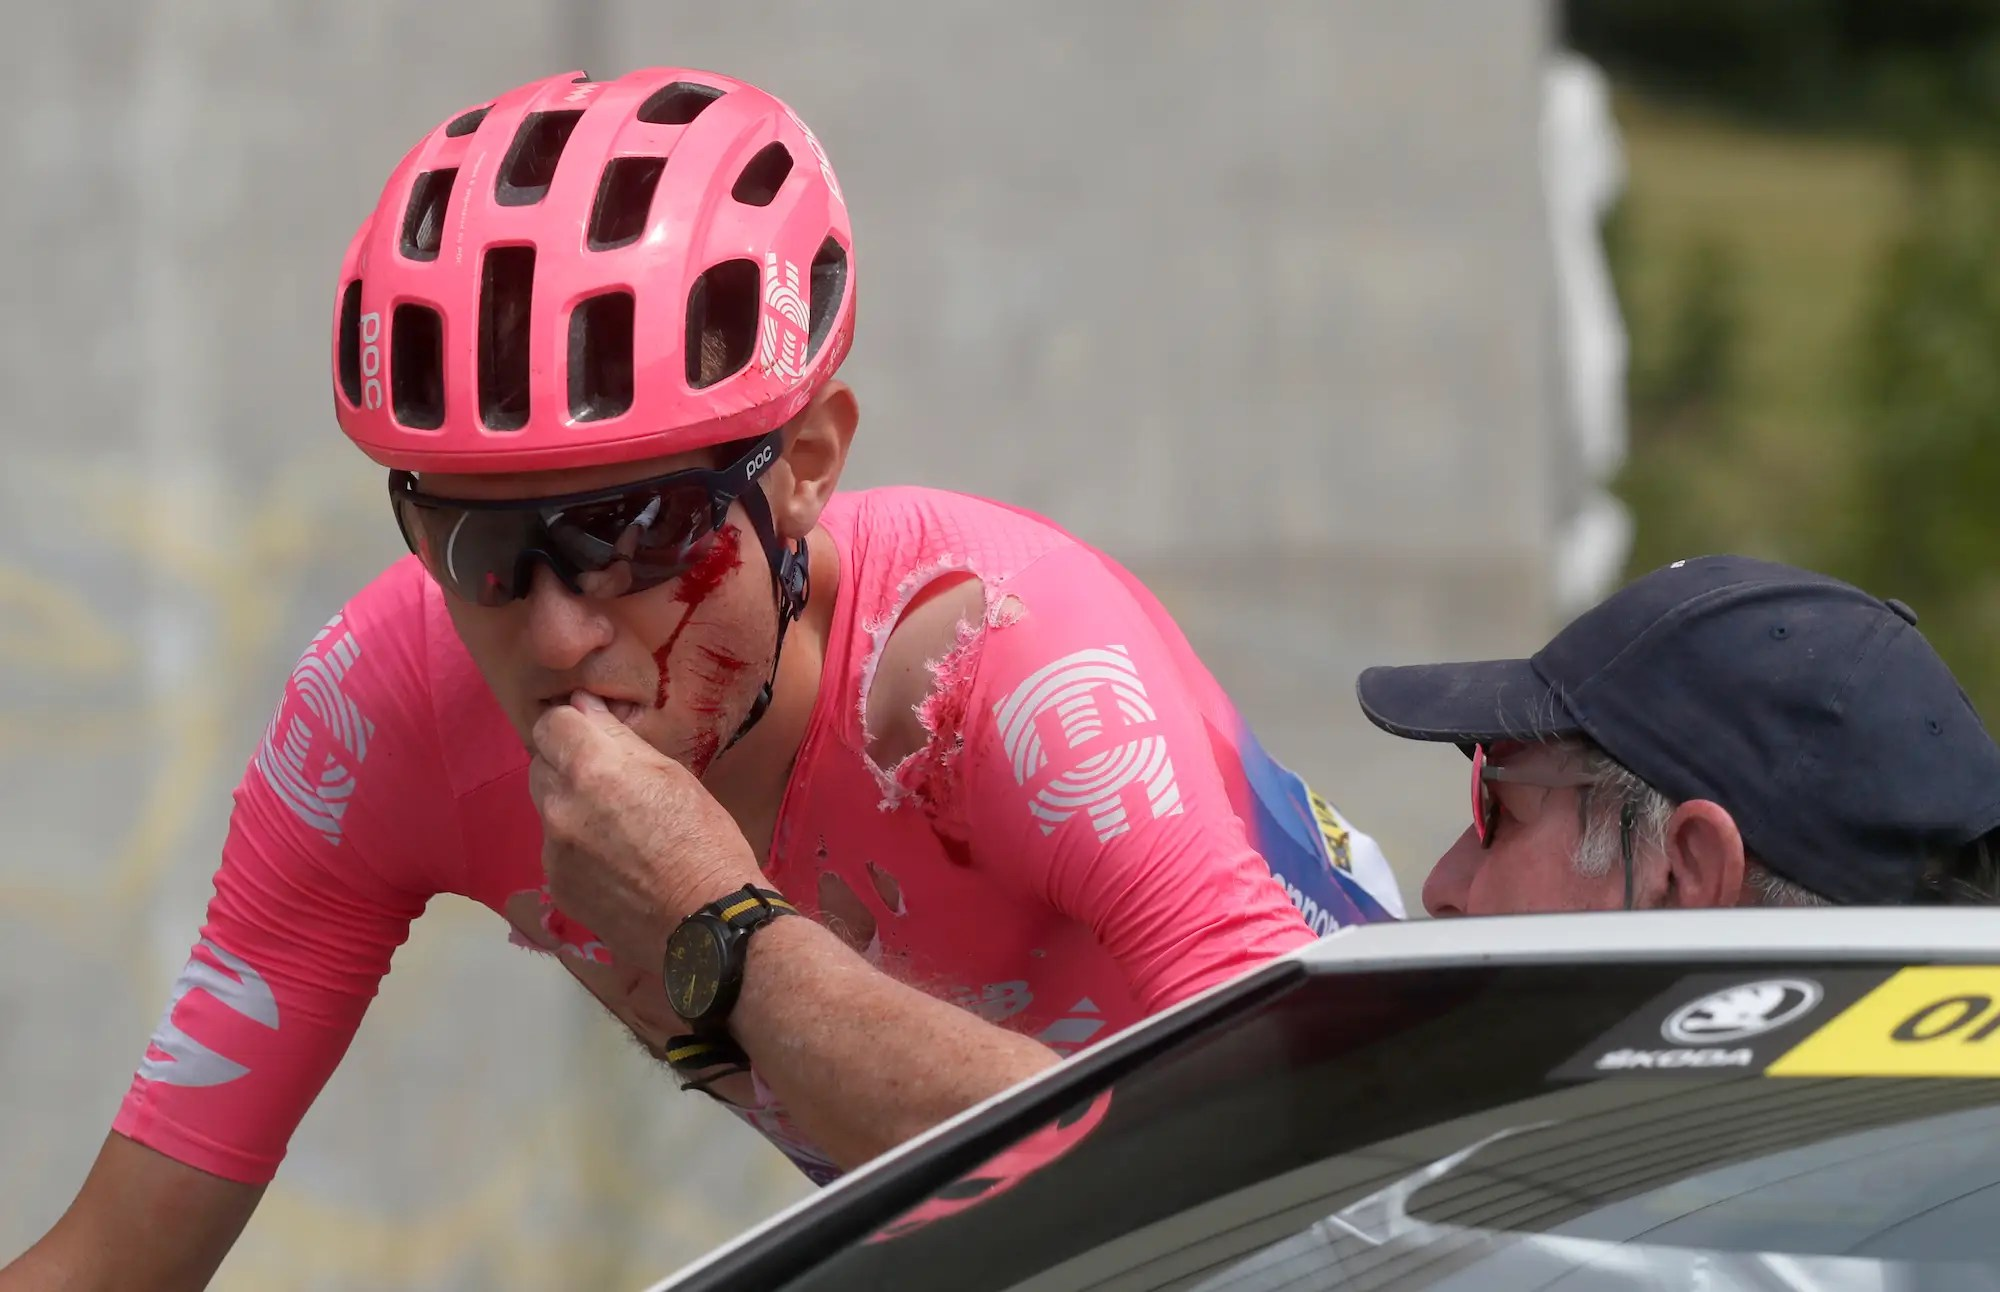 Van Garderen crashes out of Tour de France